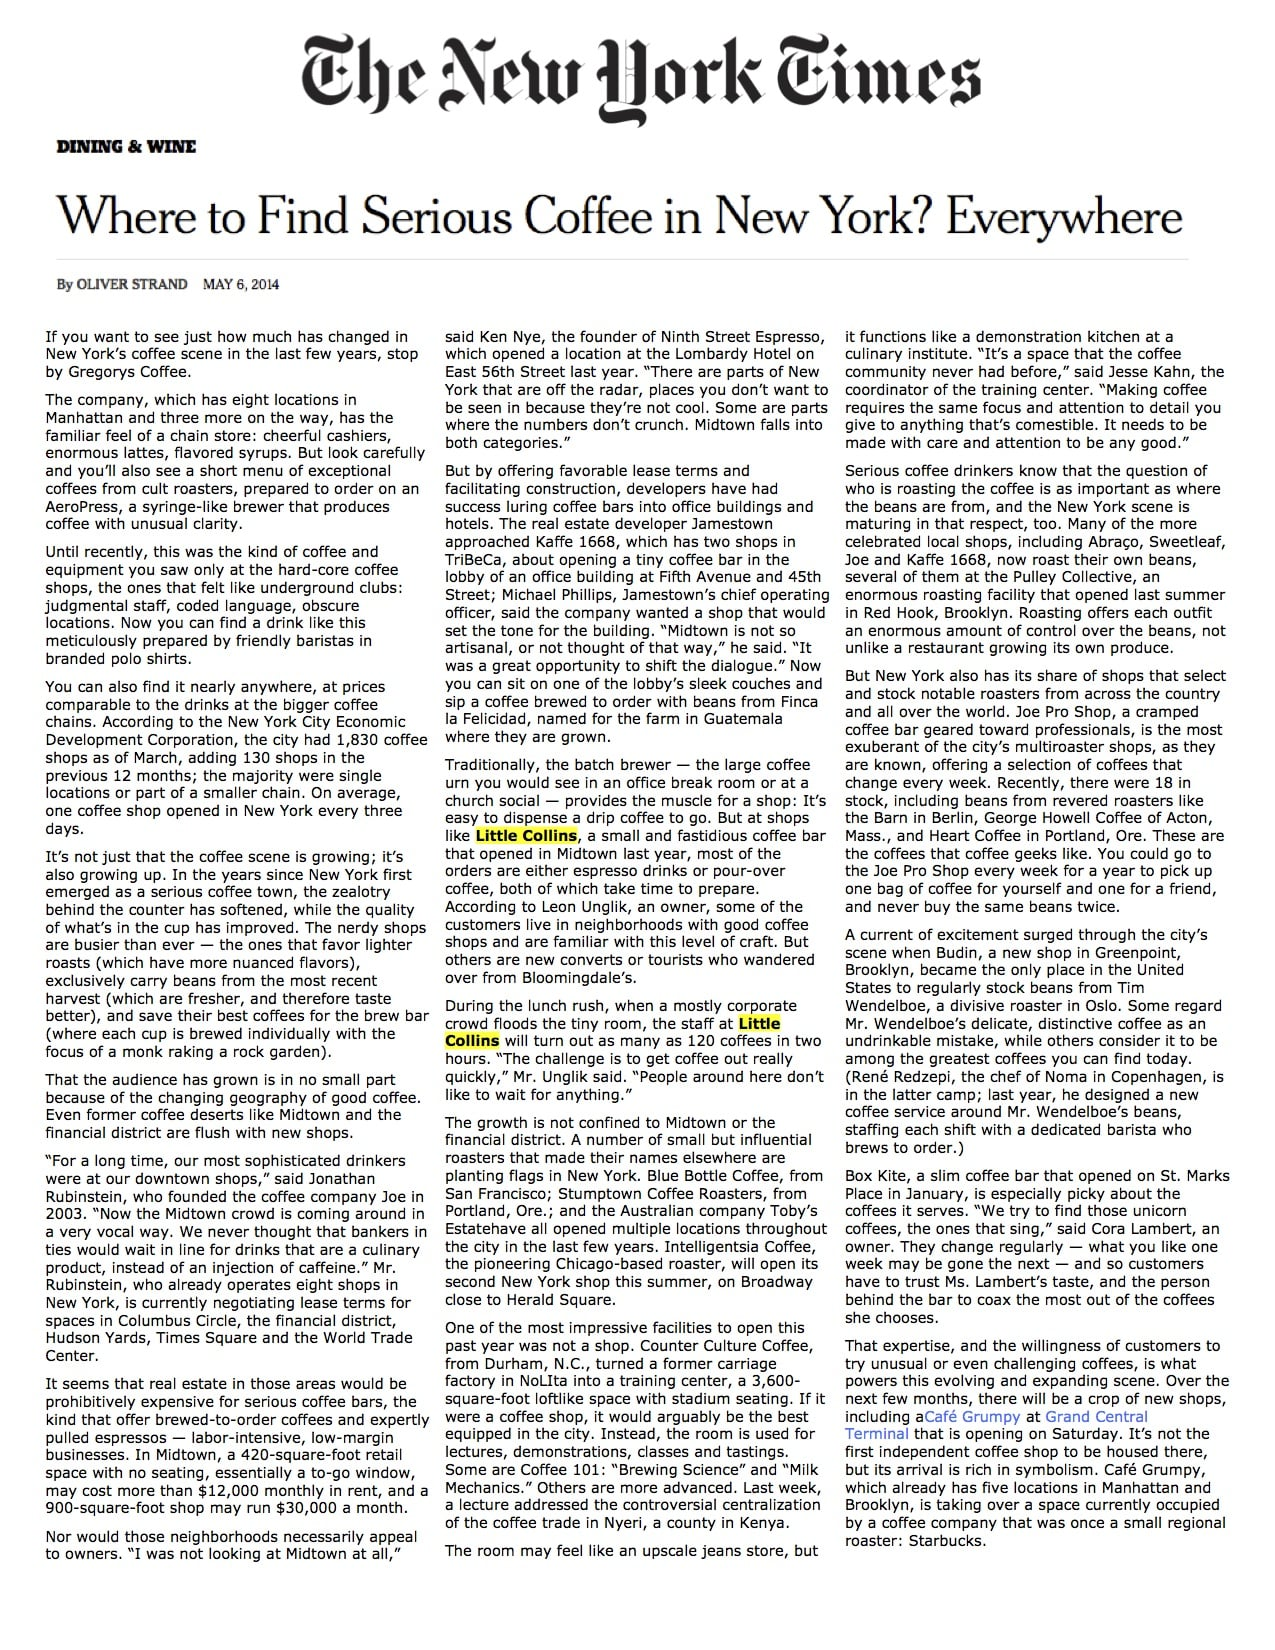 NYTimes2.jpg